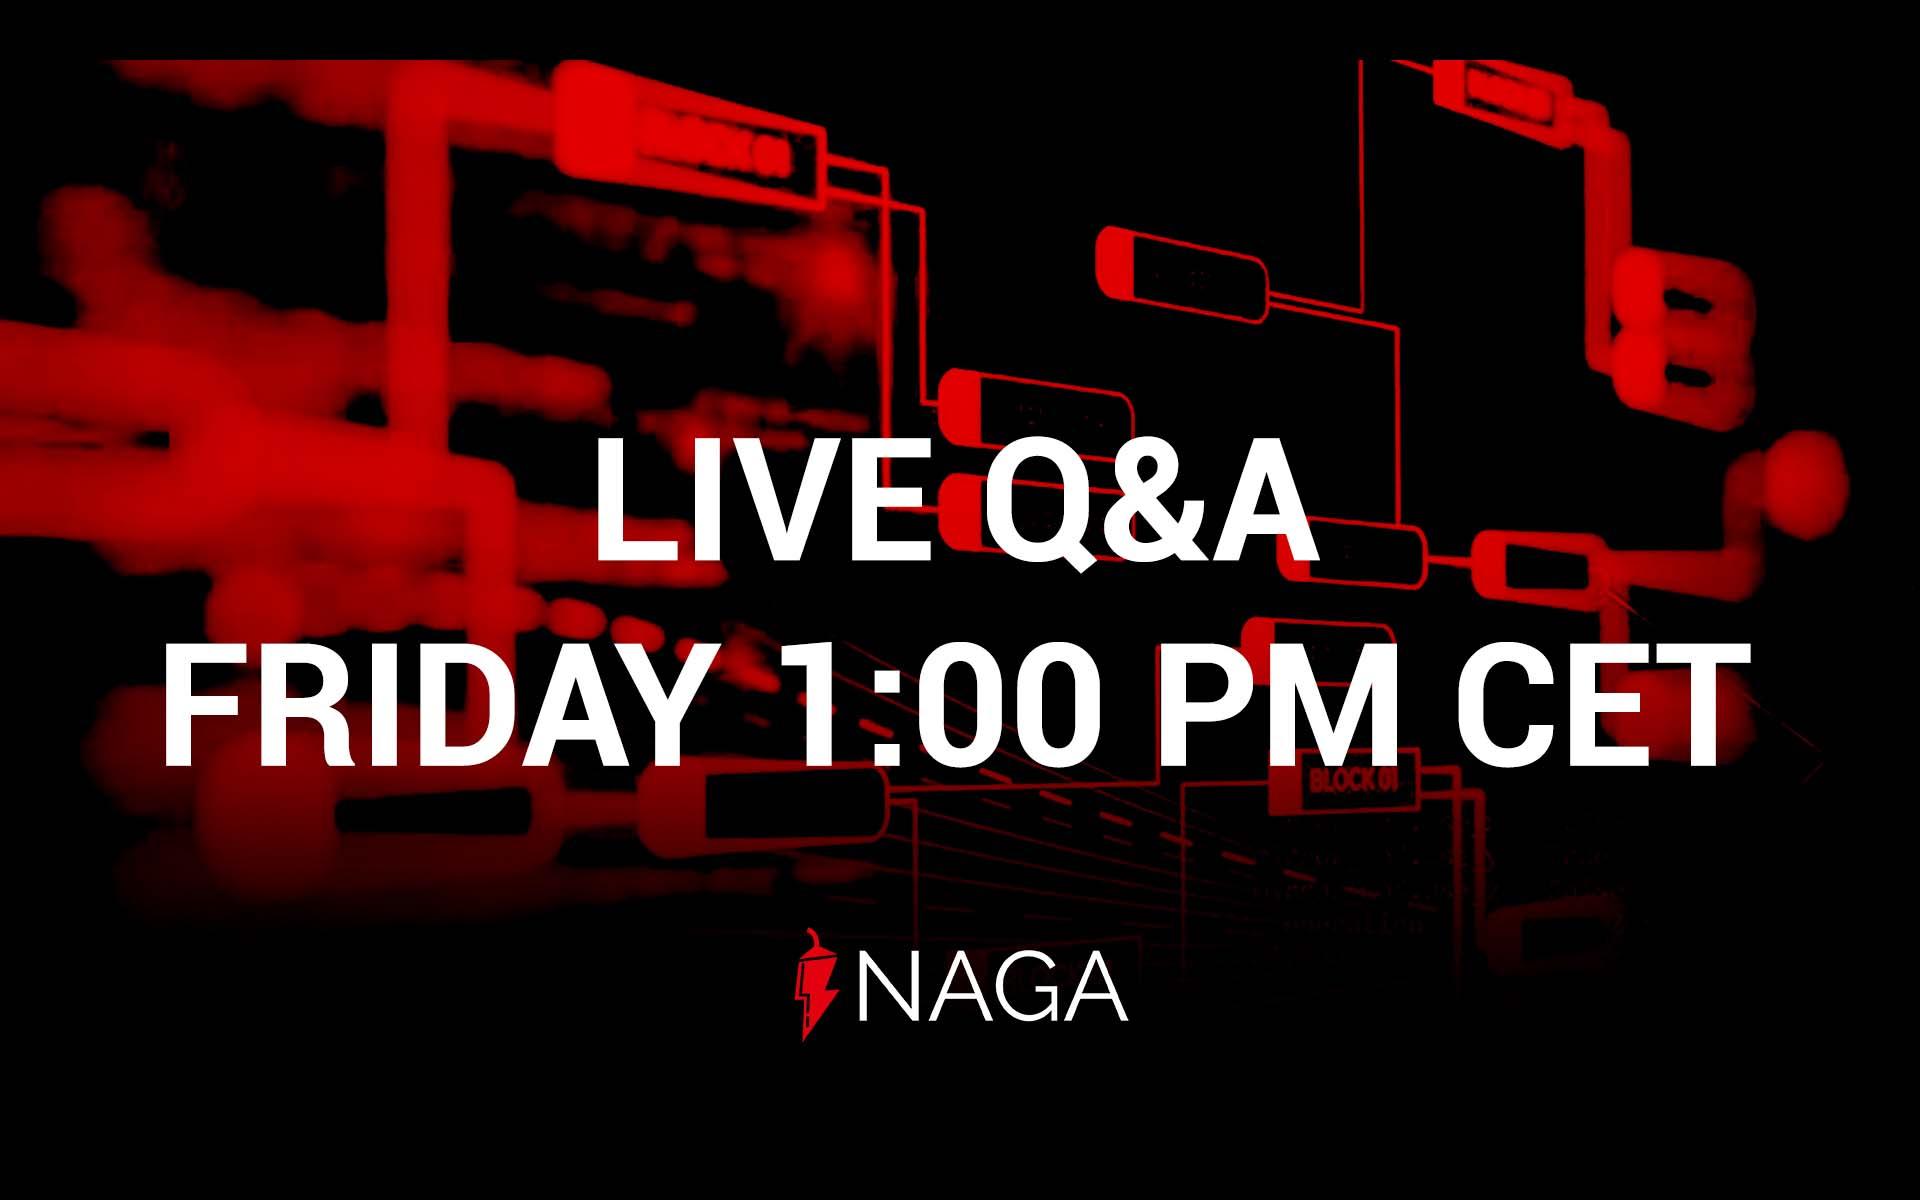 NAGA Q&A Live Event - Friday 1:00 PM CET